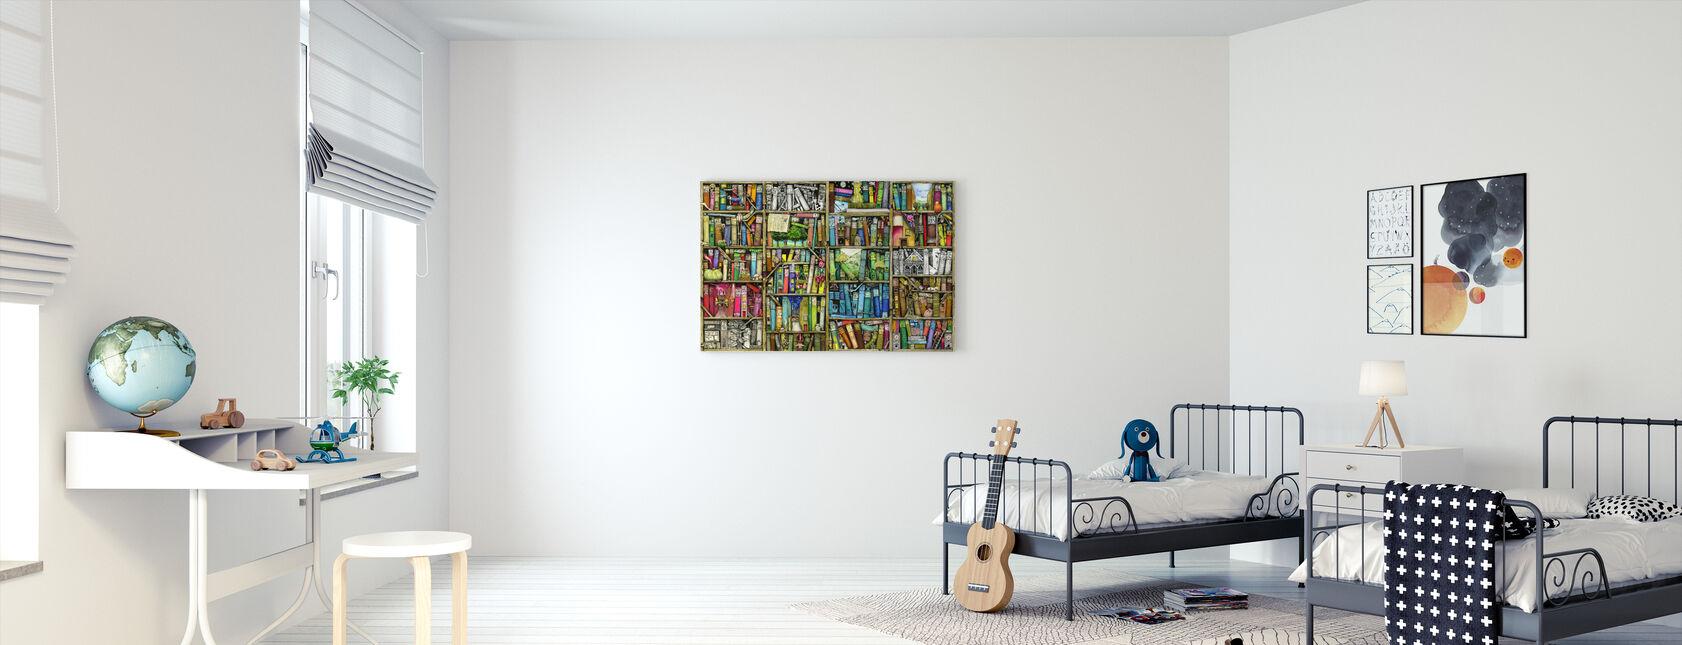 Fantasy Bookshelf - Canvas print - Kids Room